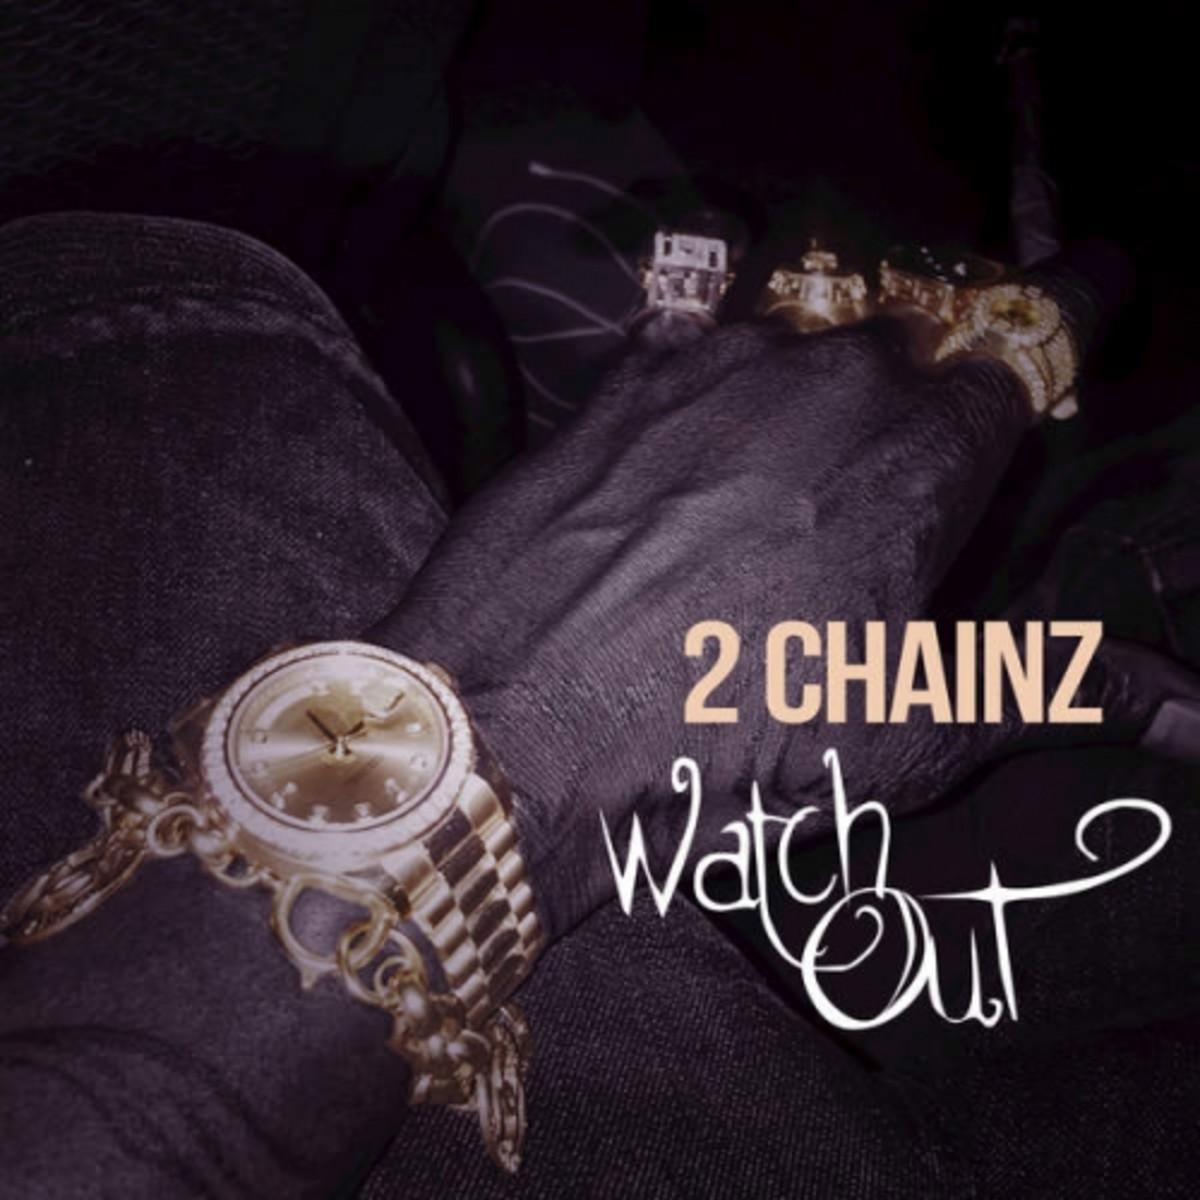 2-chainz-watch-out.jpg